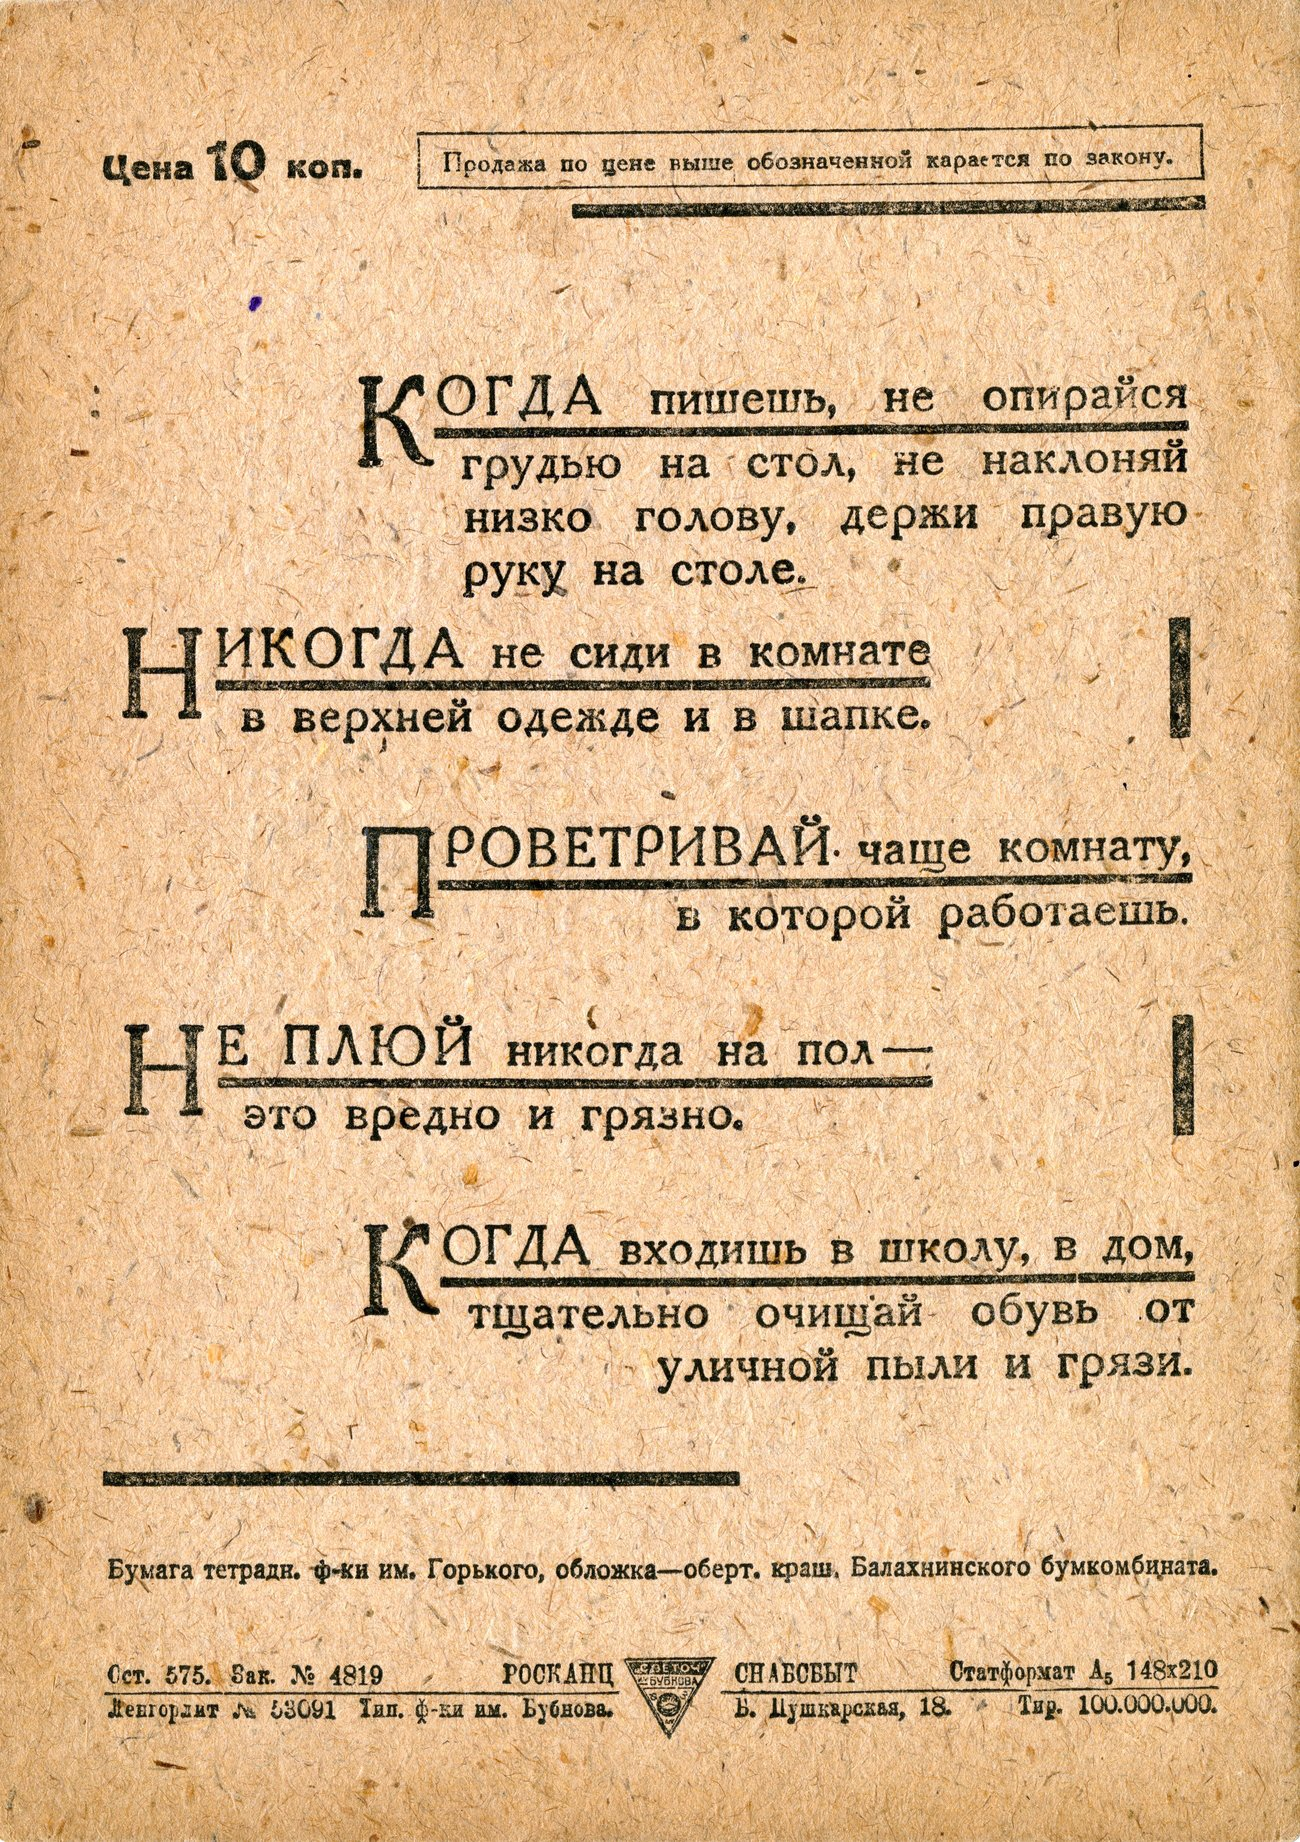 Тетрадь РОСКАНЦСНАБСБЫТ, оборот